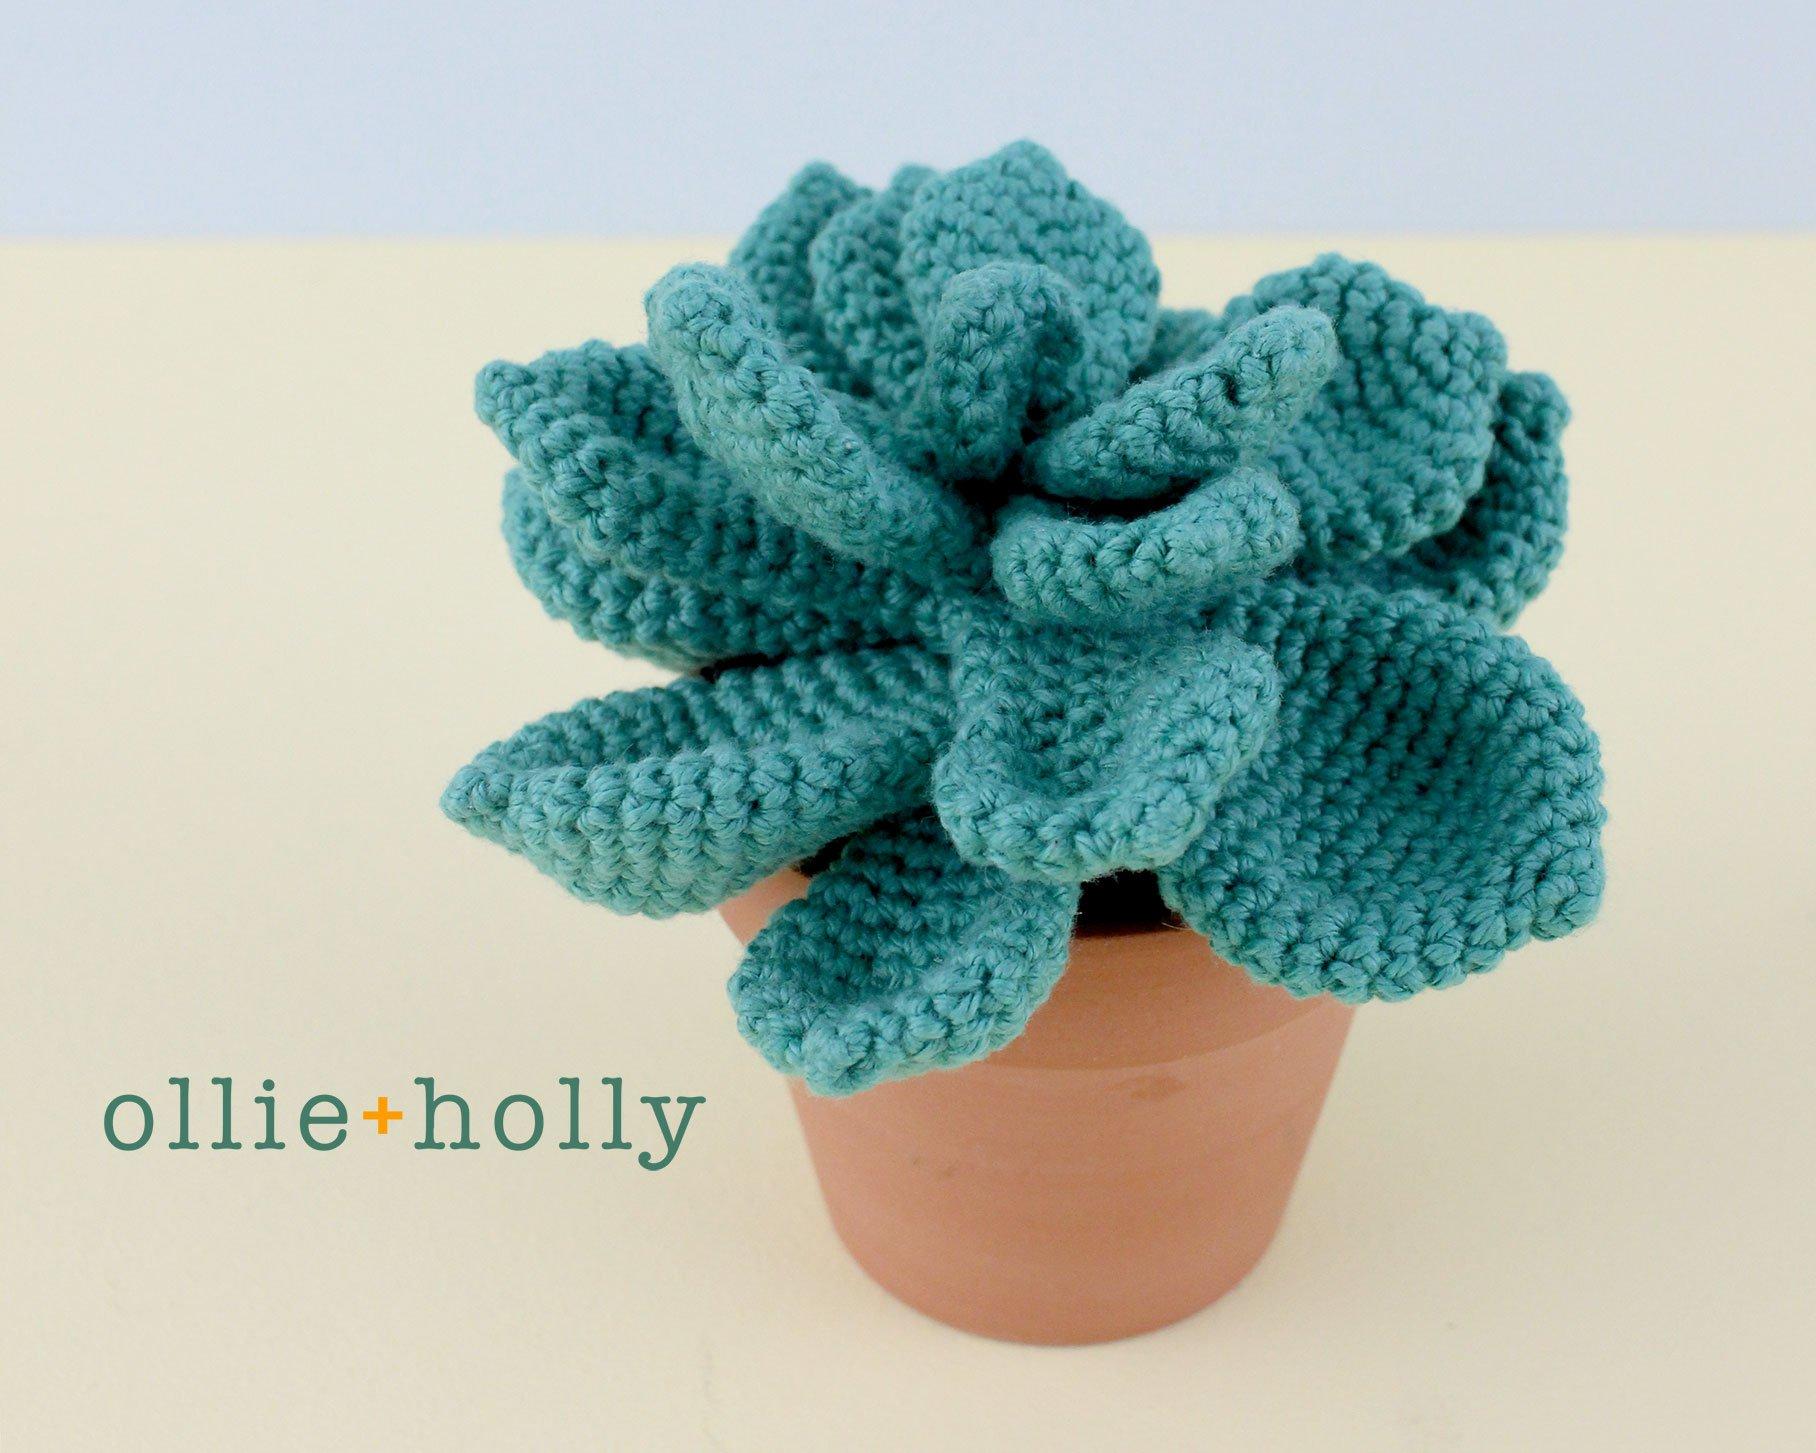 Crochet DIY: Succulent Plants Project | Crochet succulent, Crochet ... | 1453x1816